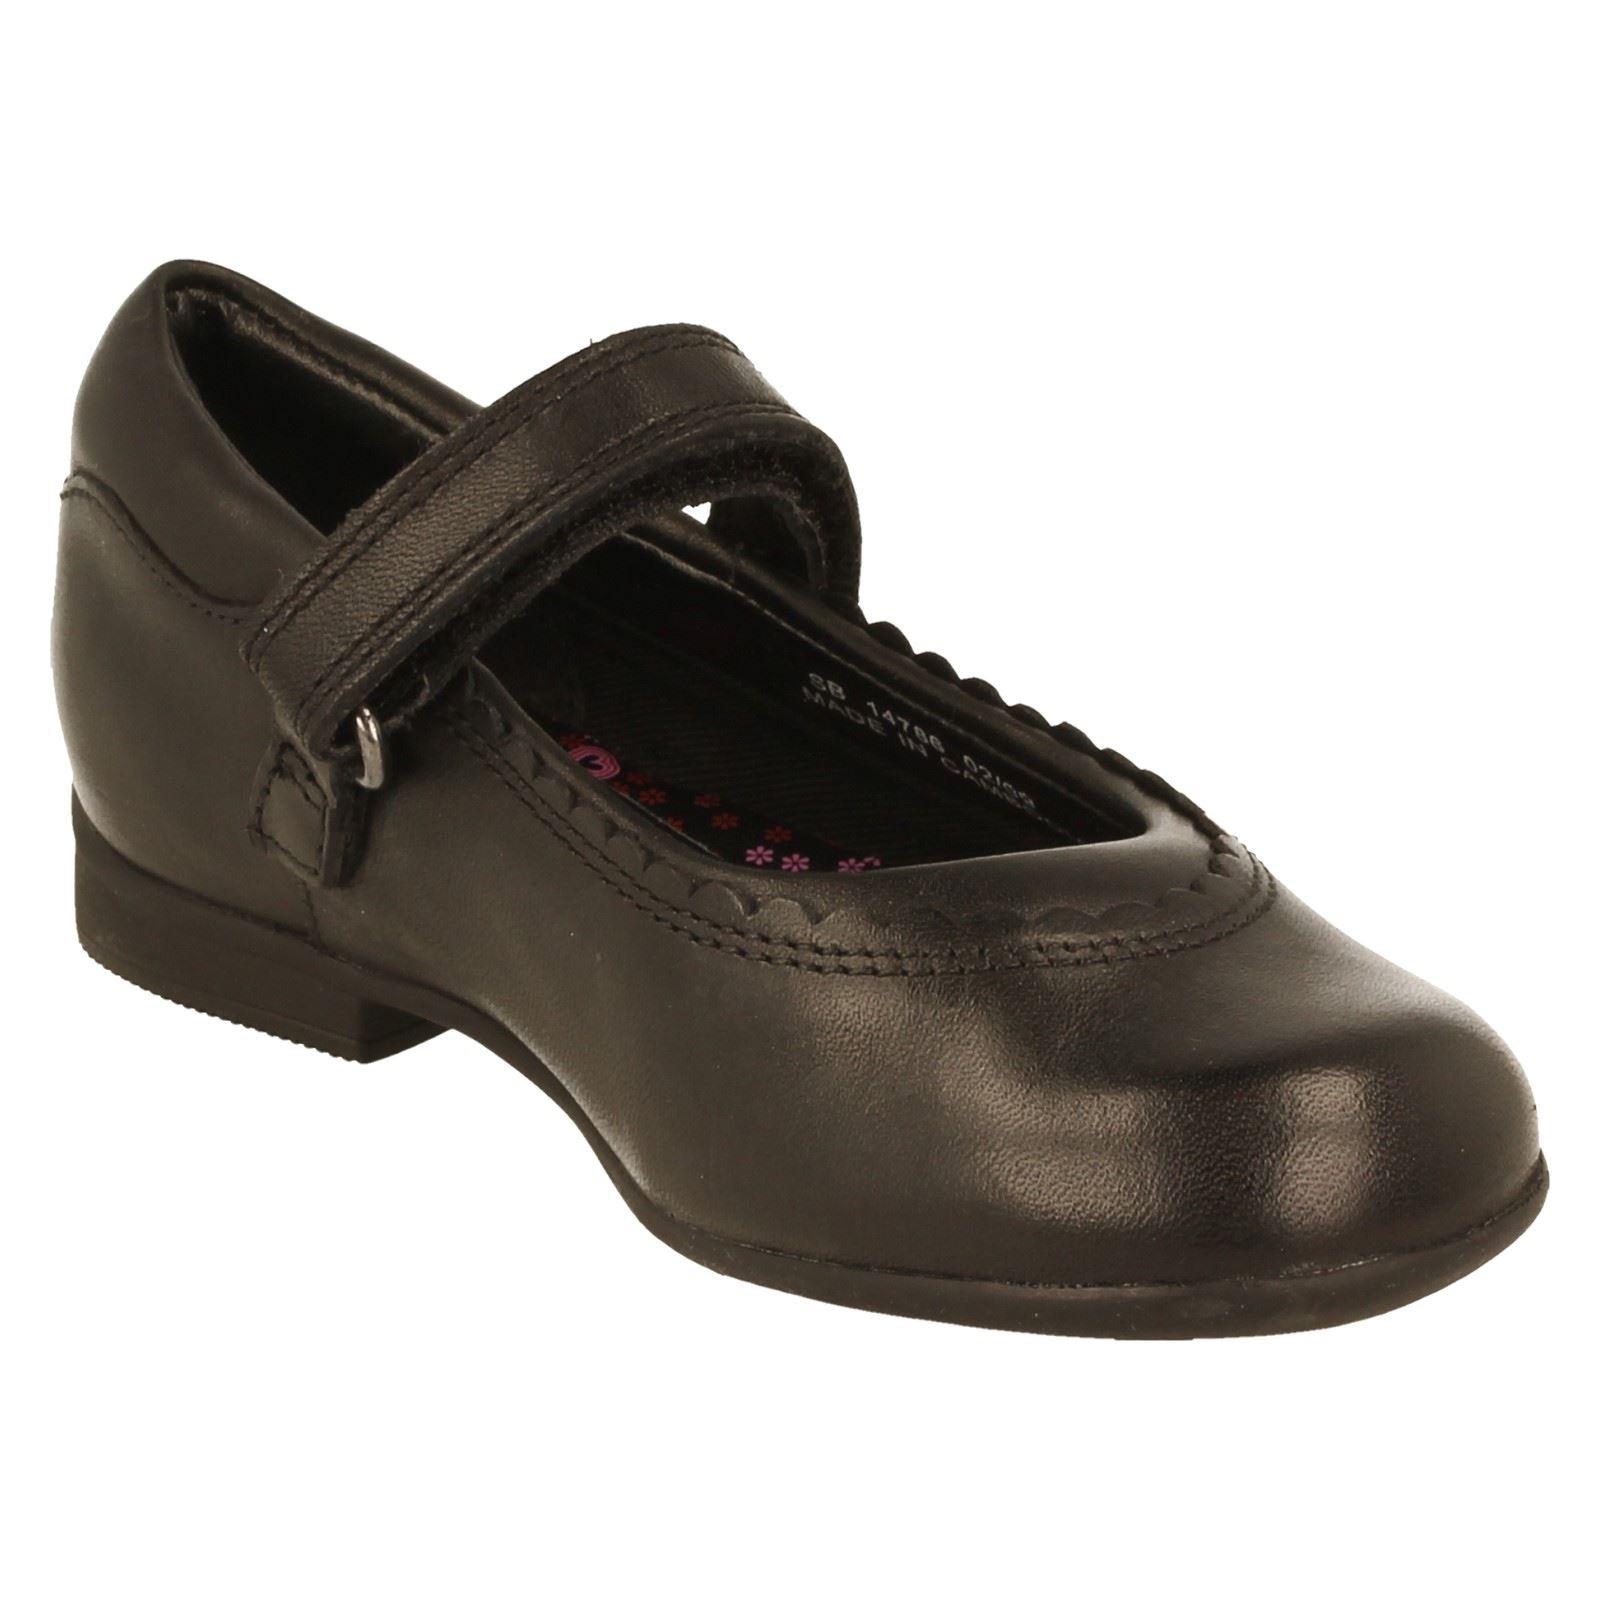 Girls Clarks Mary Jane Shoes Style Dolly Twist -W